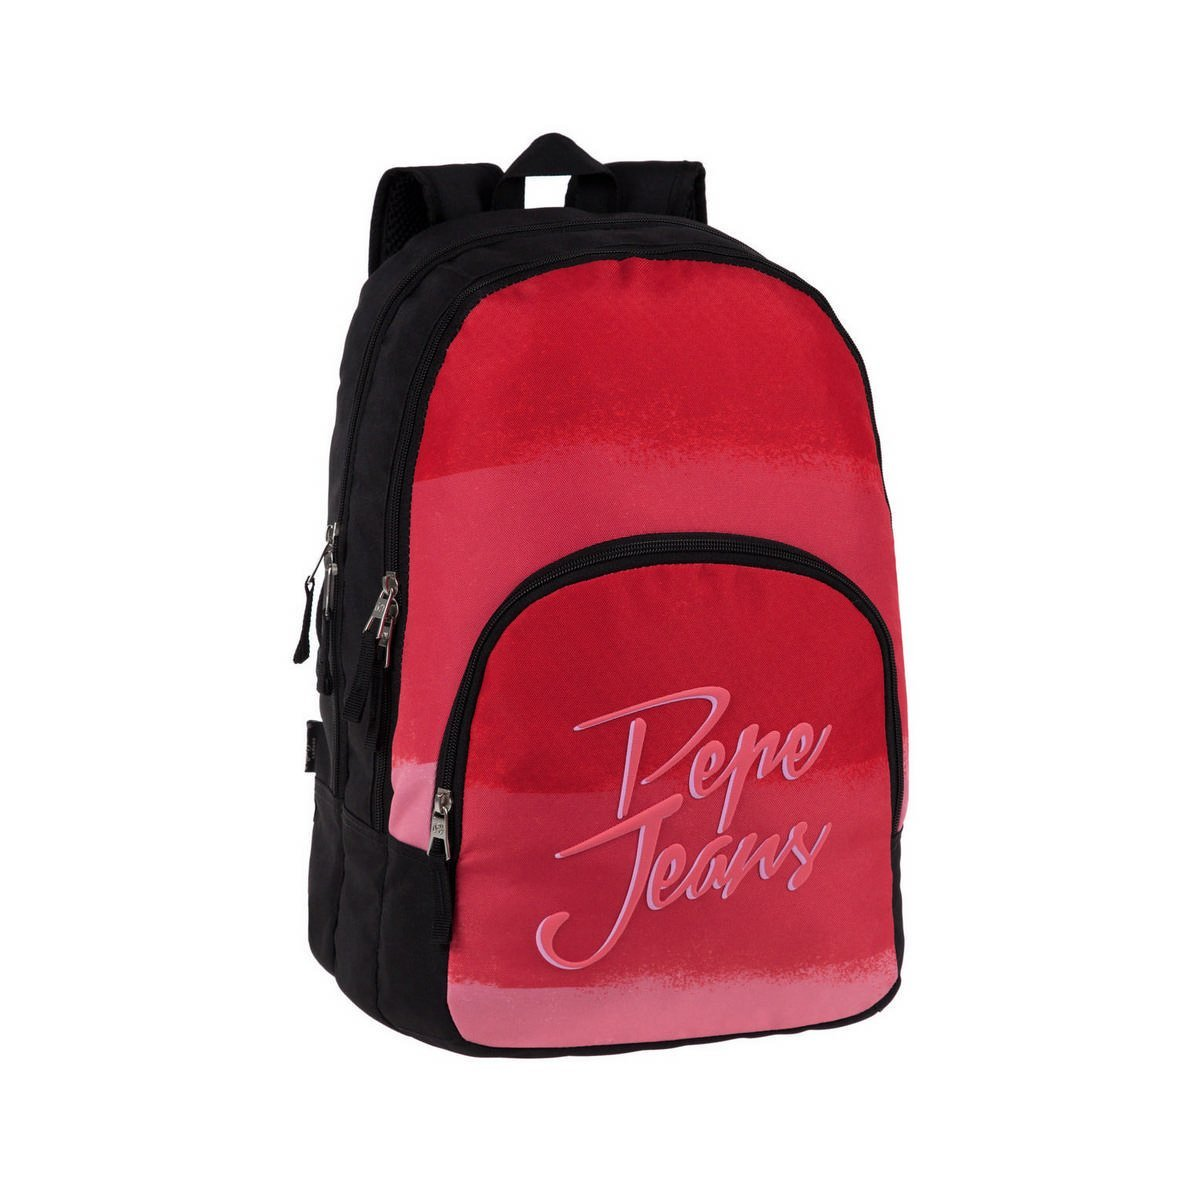 Pepe Jeans 6382451 Linden Mochila Escolar, 30.98 Litros, Color Rosa